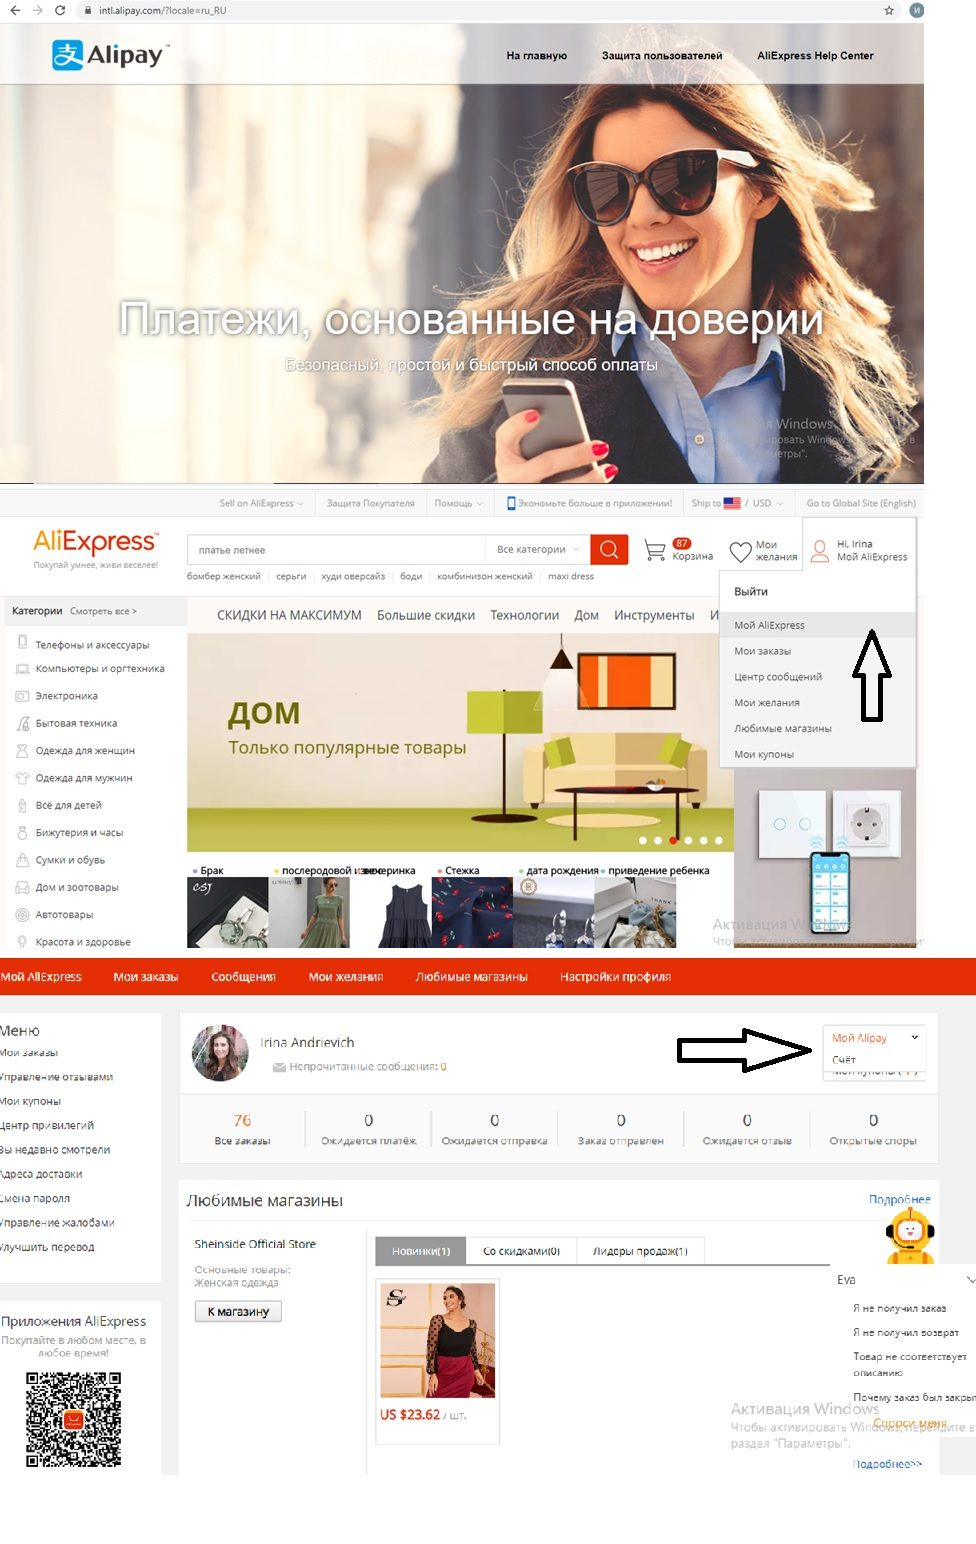 Вход на сайт Alipay